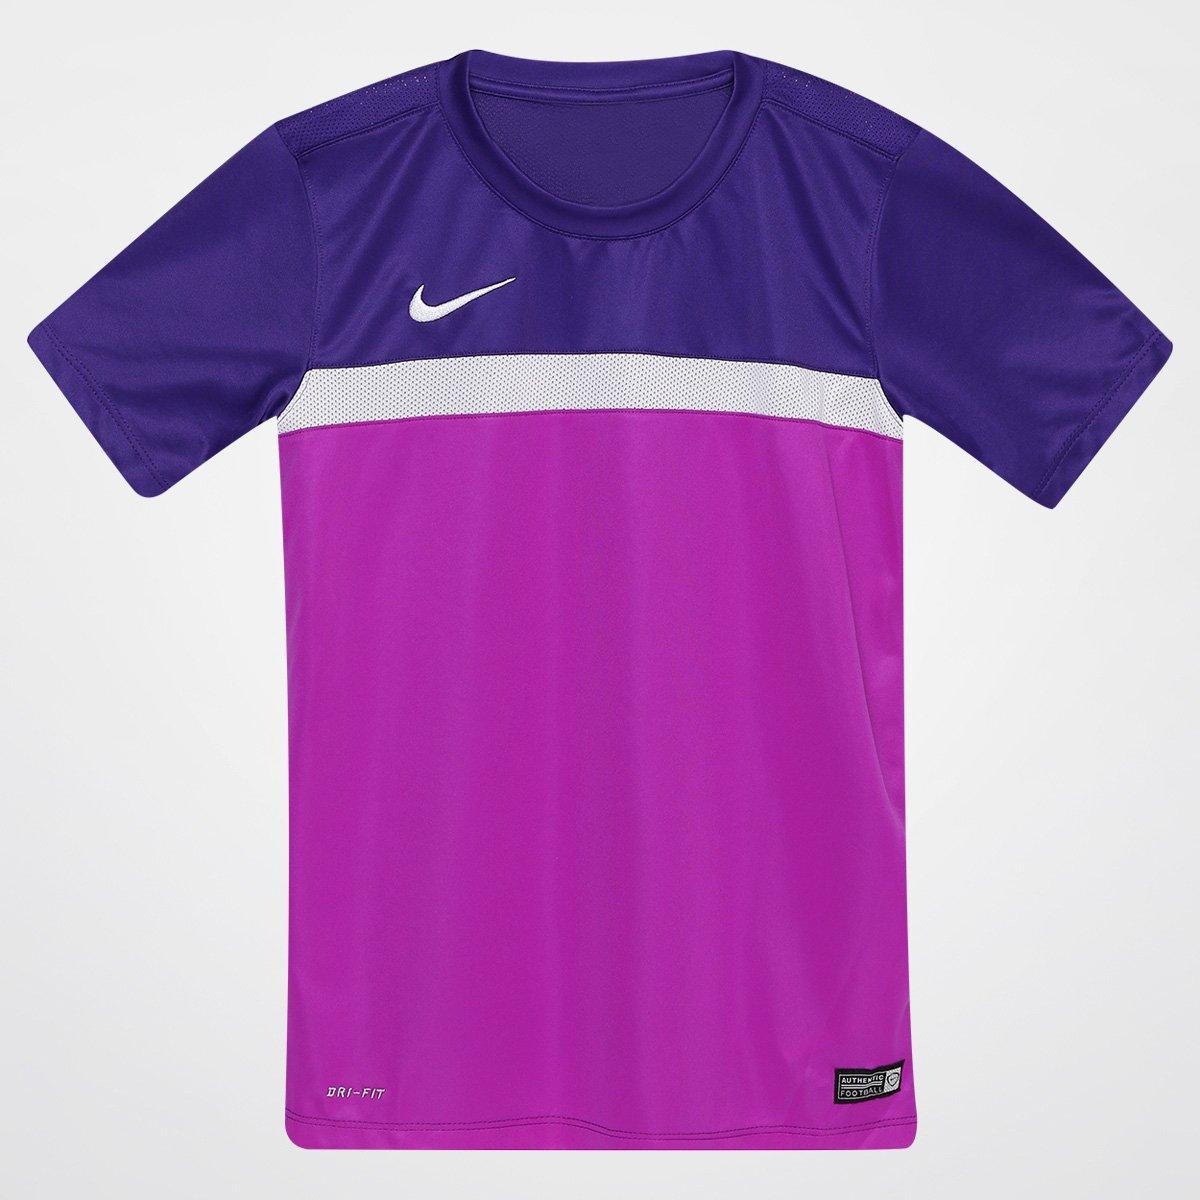 ac7b9e11b7 AVM Sports - Camiseta Nike Academy SS Training Top 544896-100 - 544896-100